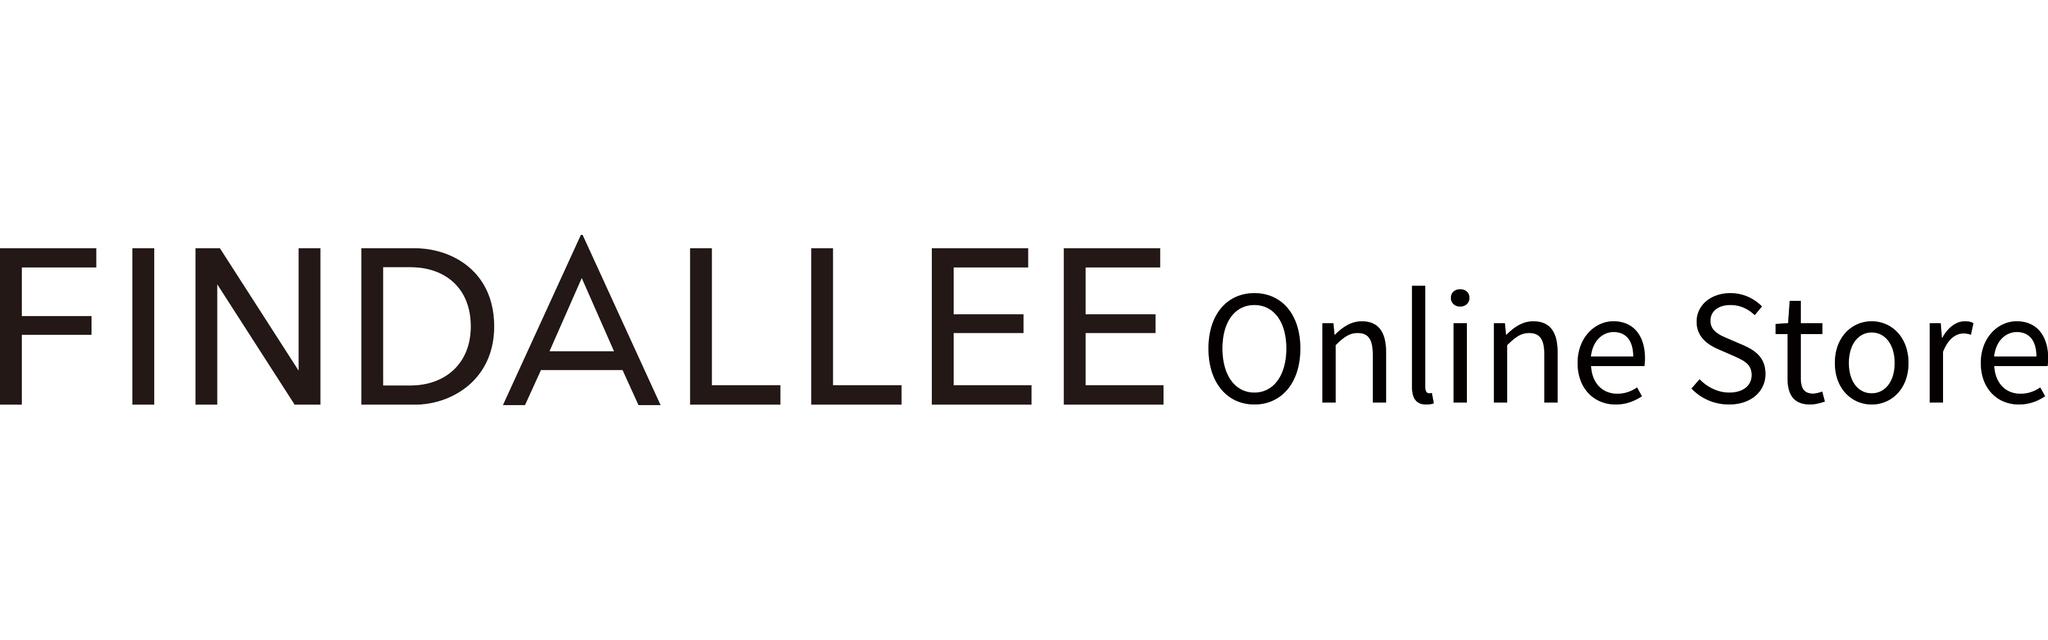 FINDALLEE Online Store